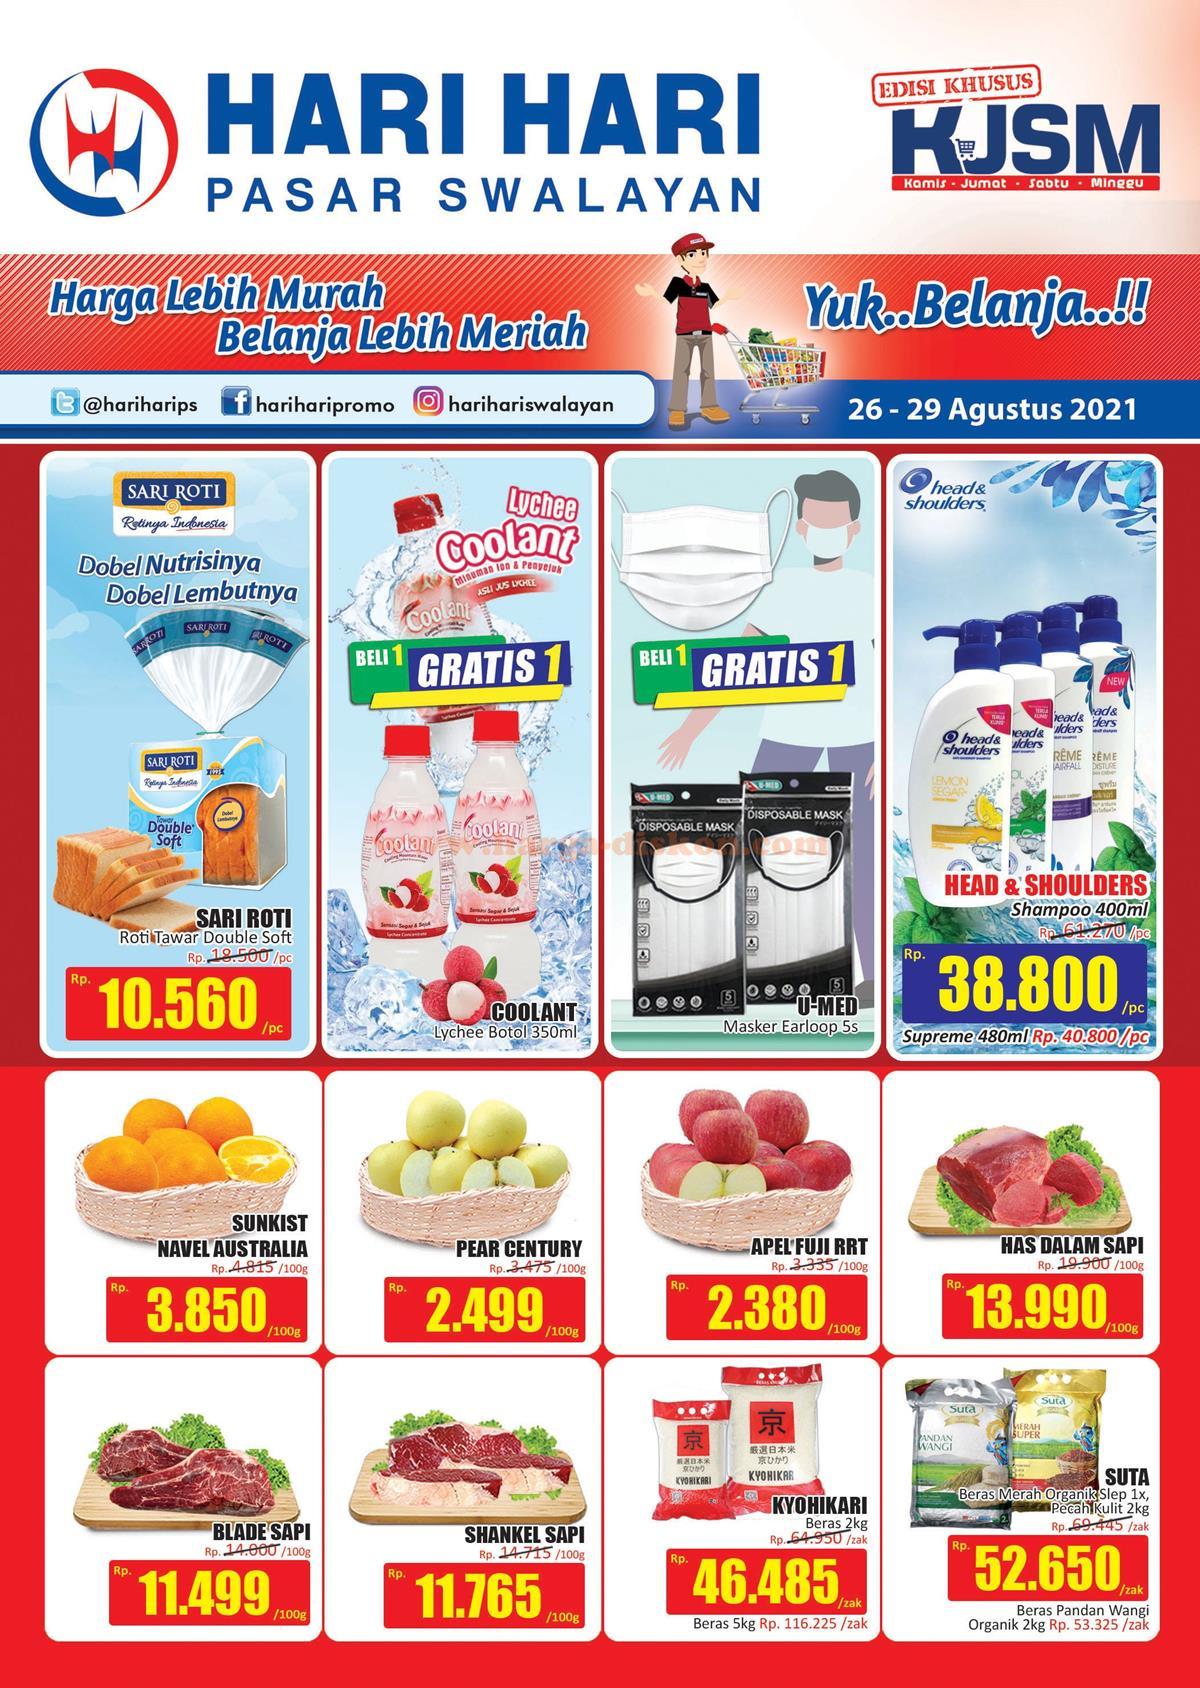 Promo HARI HARI Akhir Pekan Weekend Promo KJSM 26 - 29 Agustus 2021